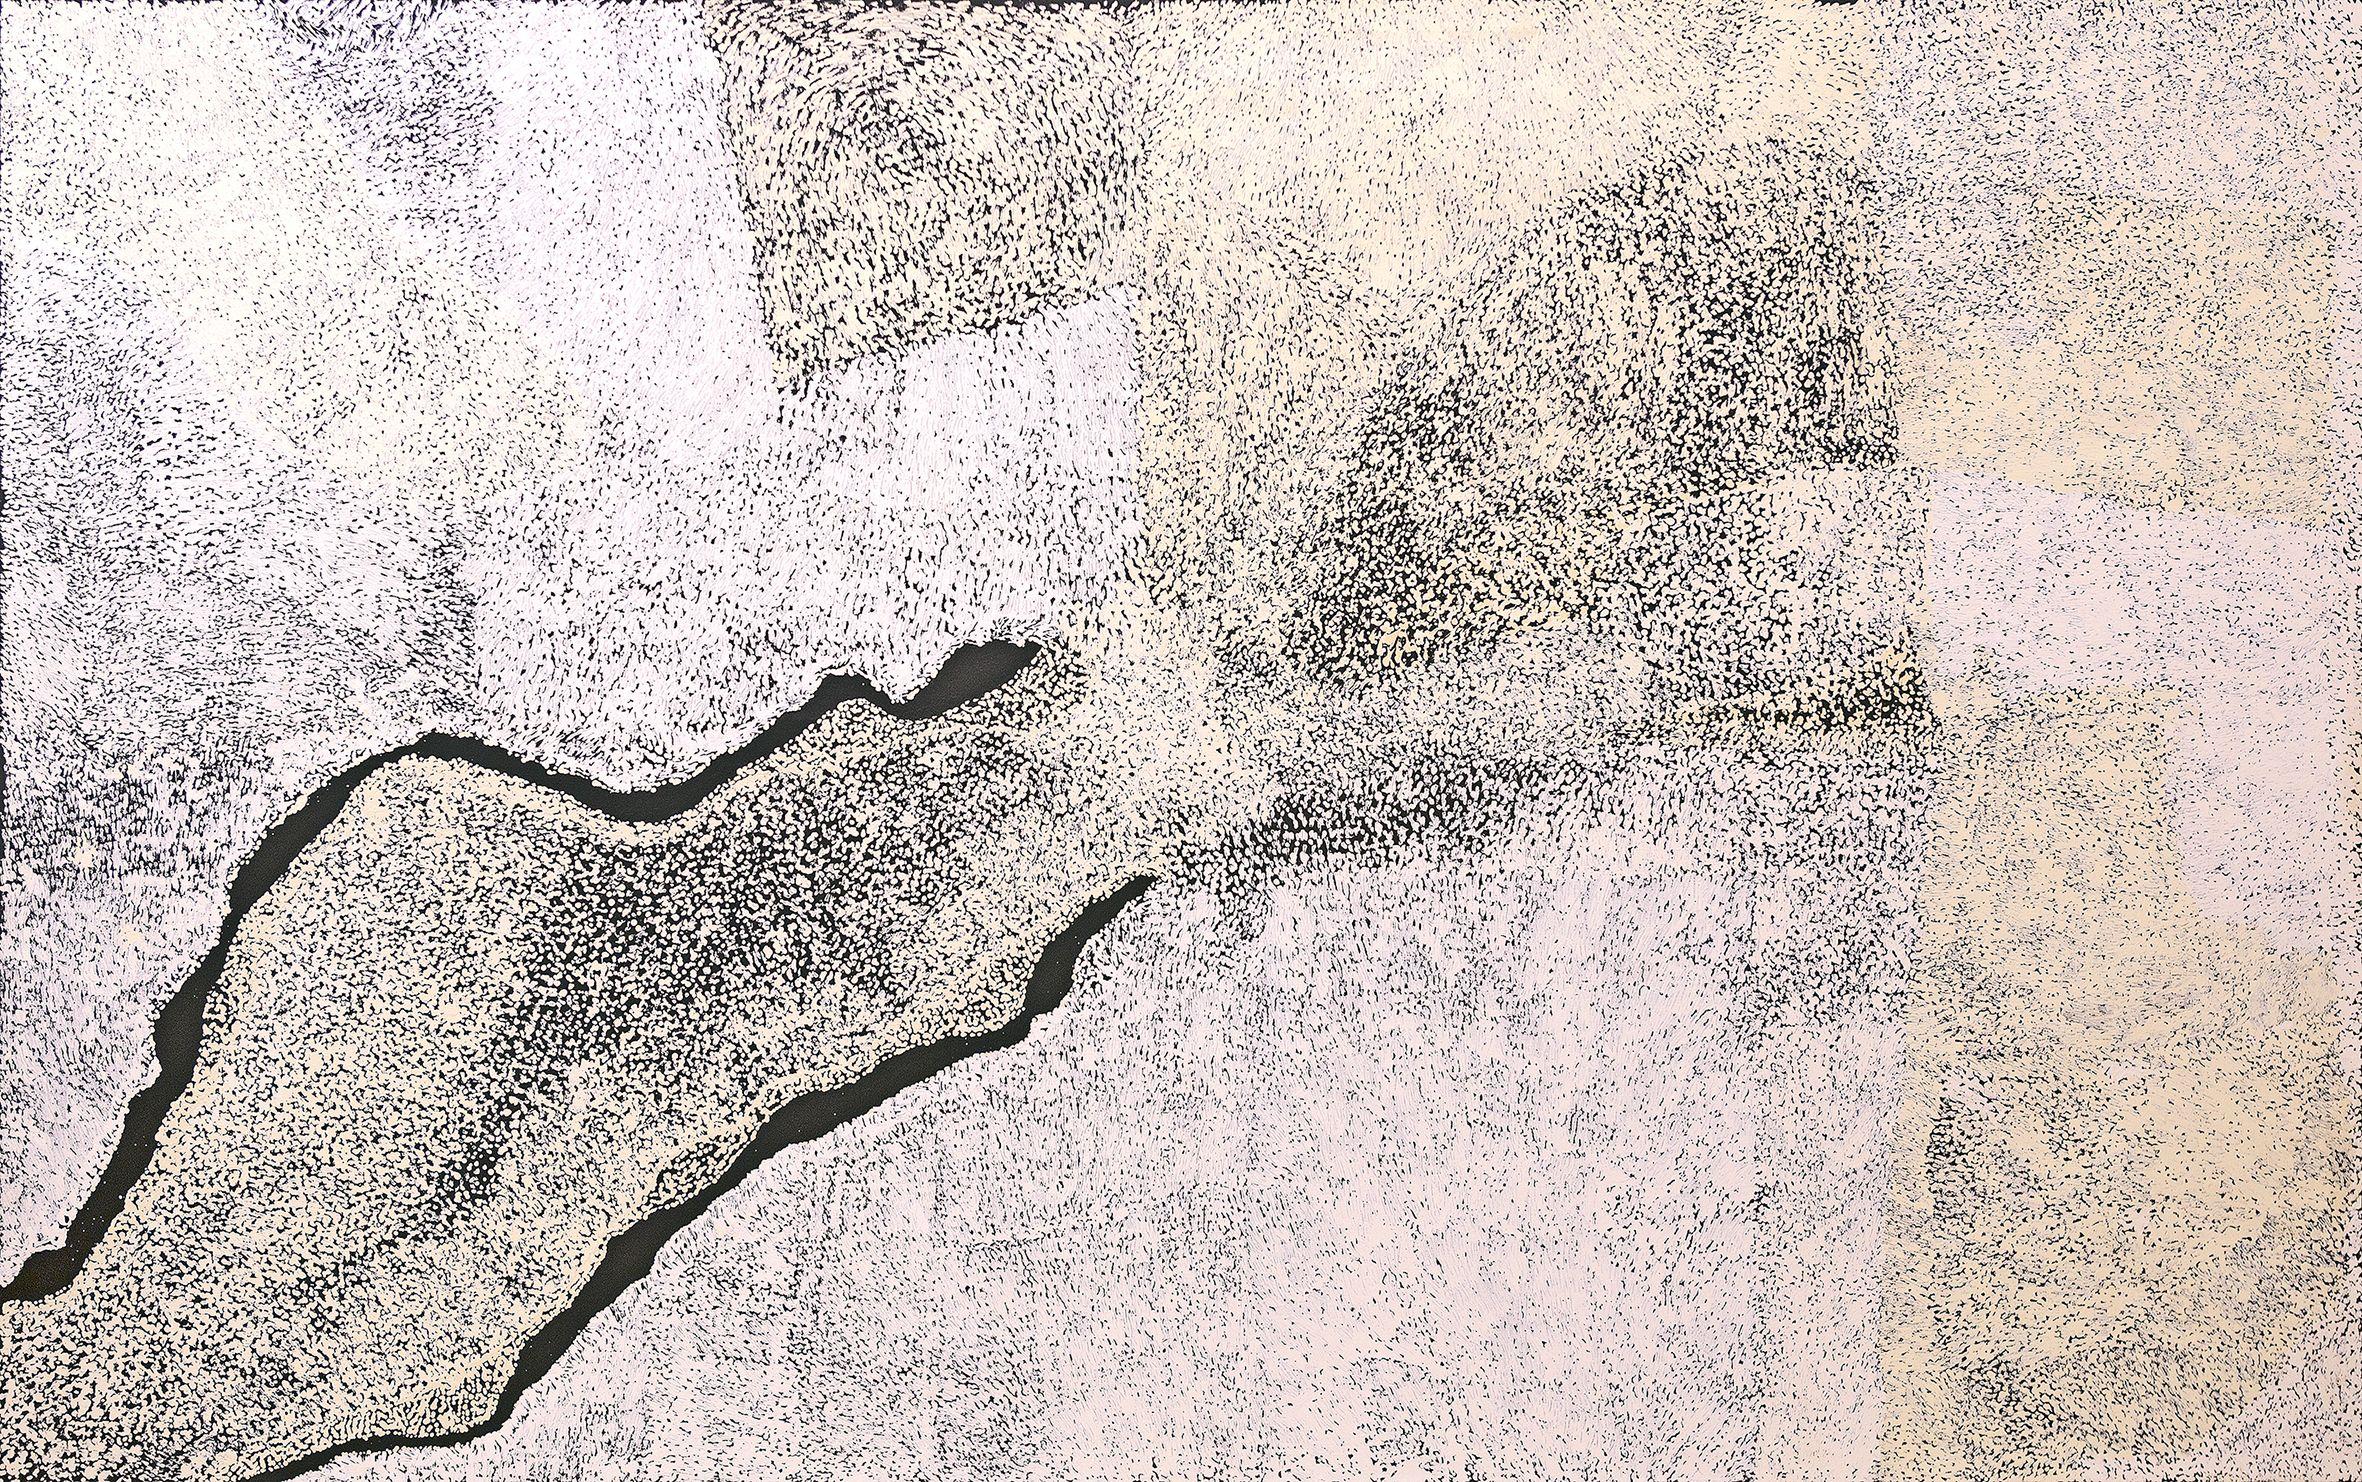 Titre : Walungurru. Artiste : Pepai Jangala Carroll. Format : 280 x 175 cm. © Photo : Aboriginal Signature with the courtesy of the artist and Ernabella Arts.  Plus d'info ici.